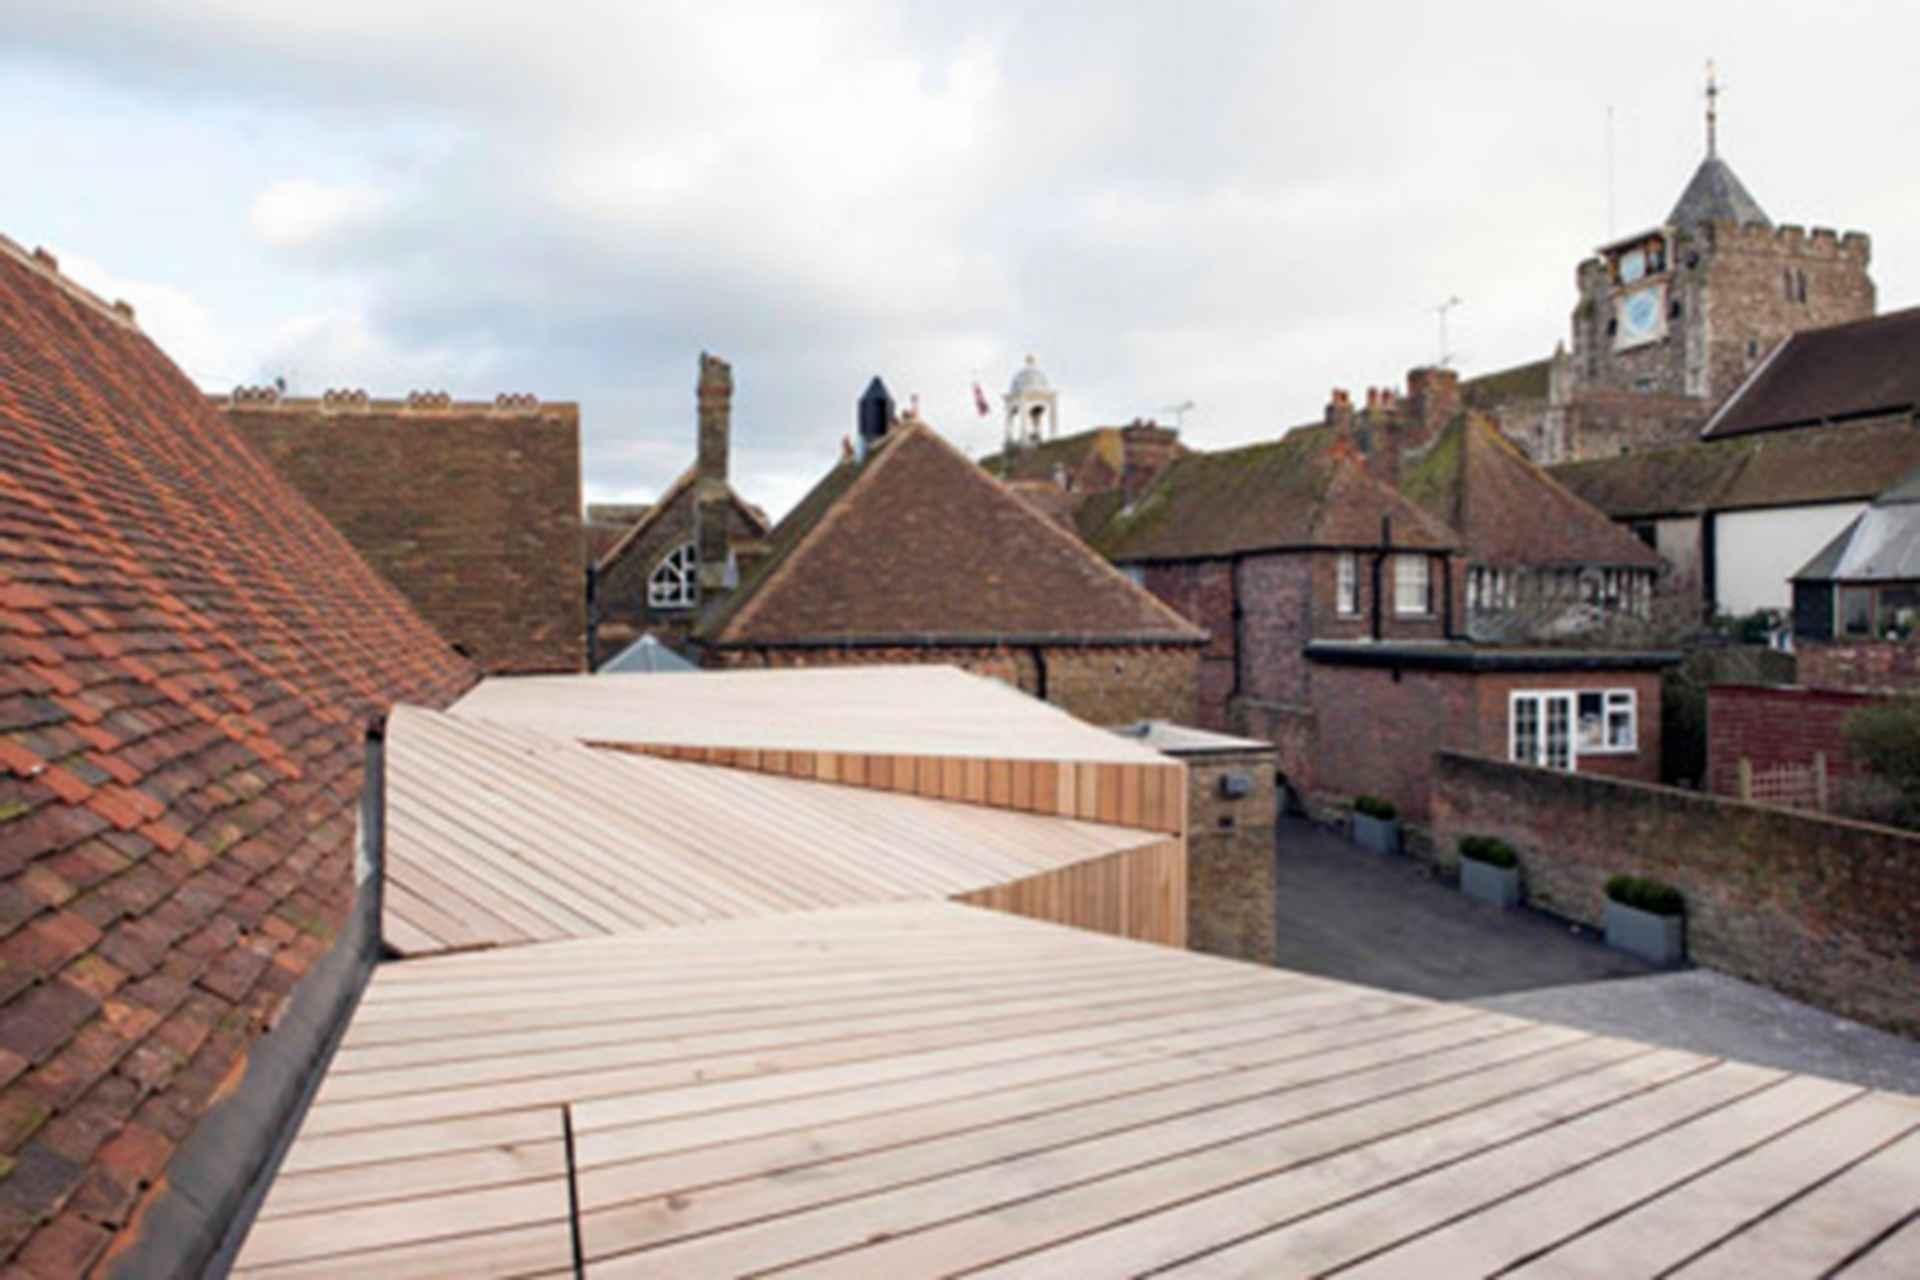 The Kino - roof